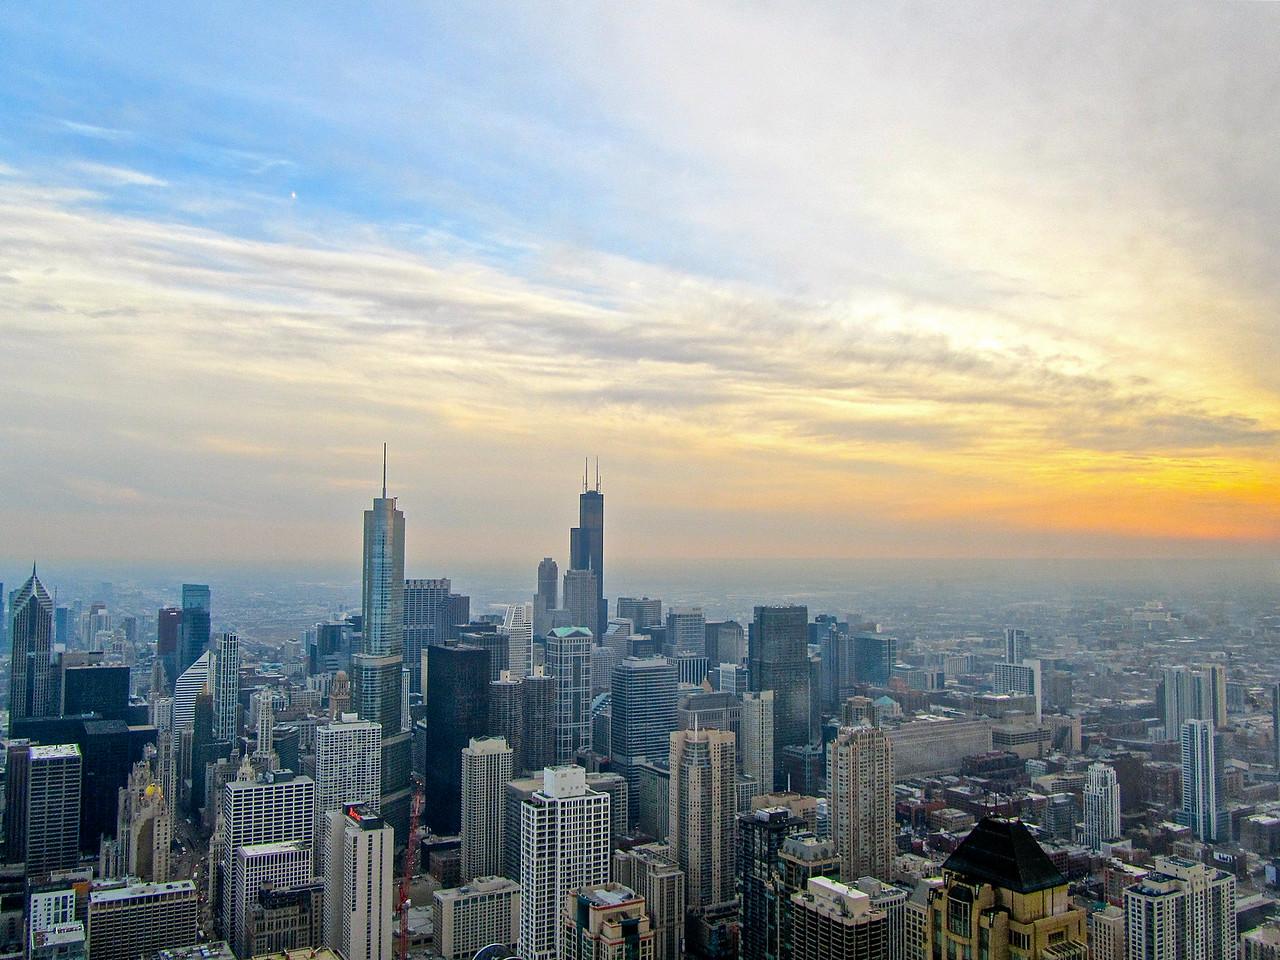 Sunset over Chicago from John Hancock Building